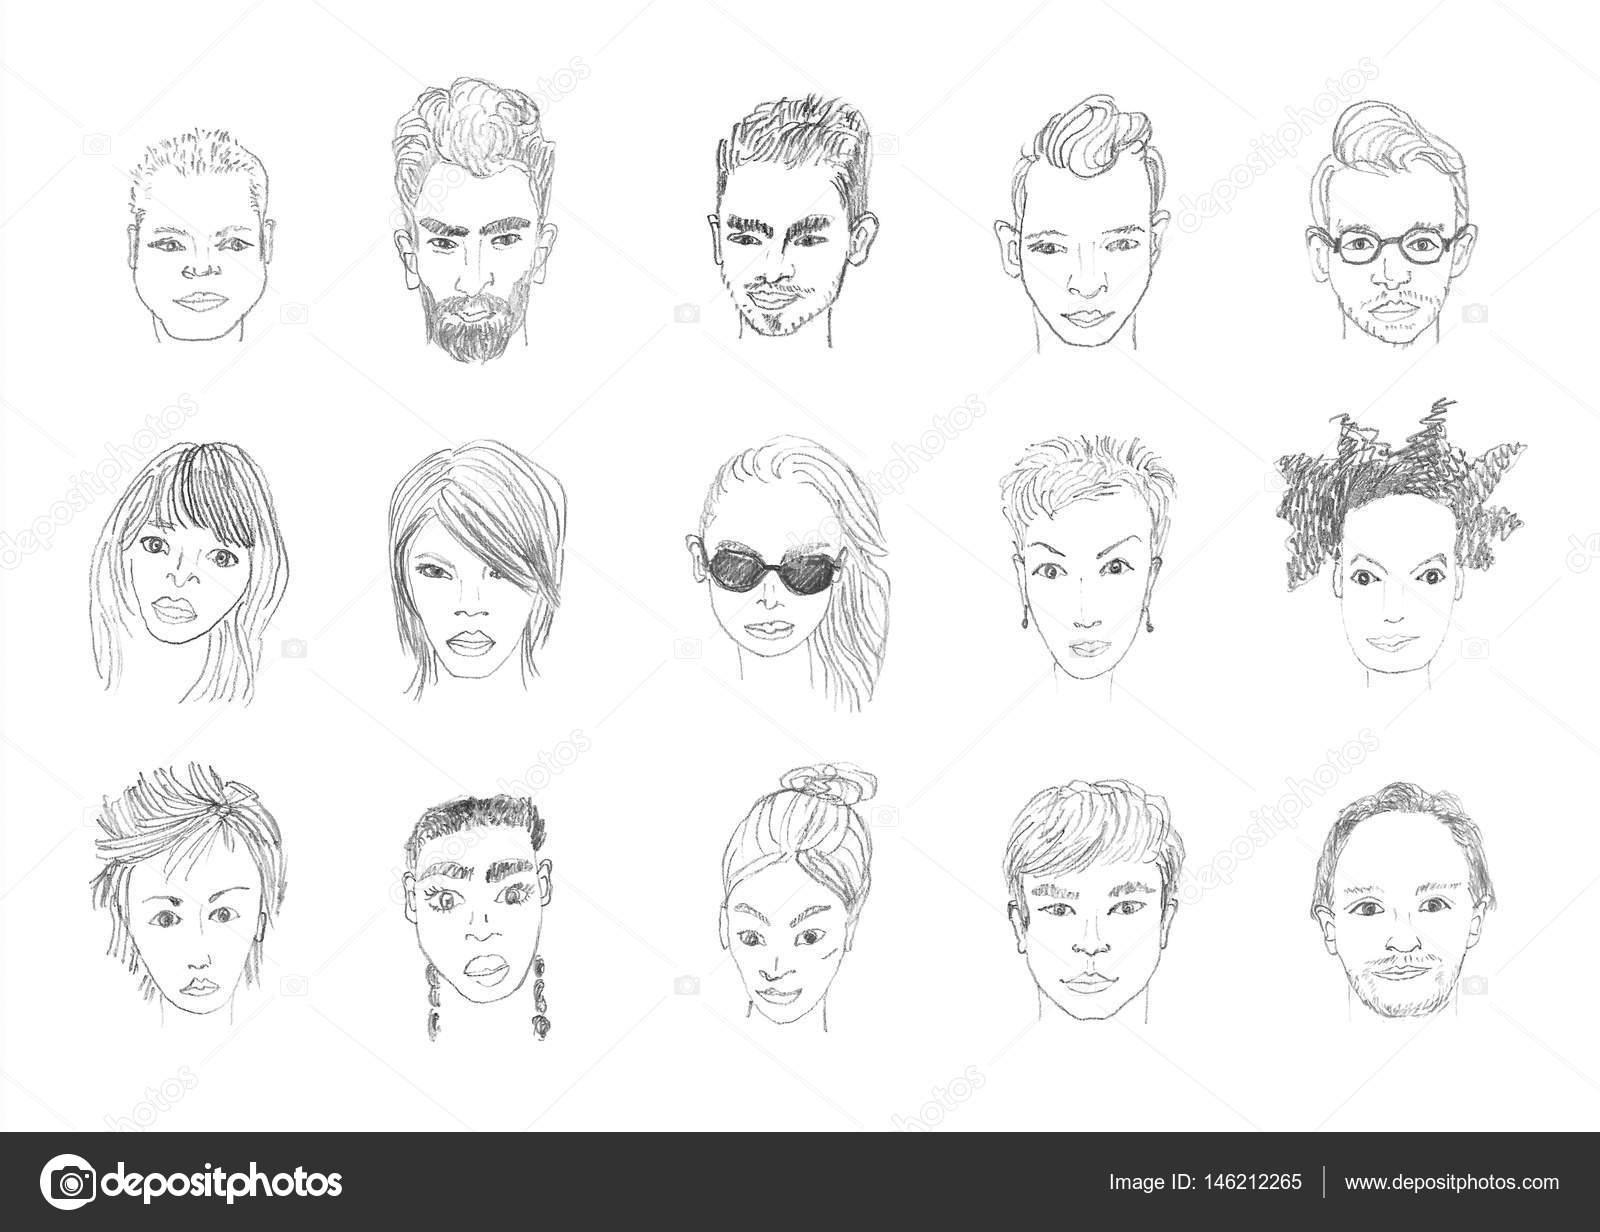 Dibujos Rostros Mujeres Dibujo A Lápiz Caras Gente Foto De